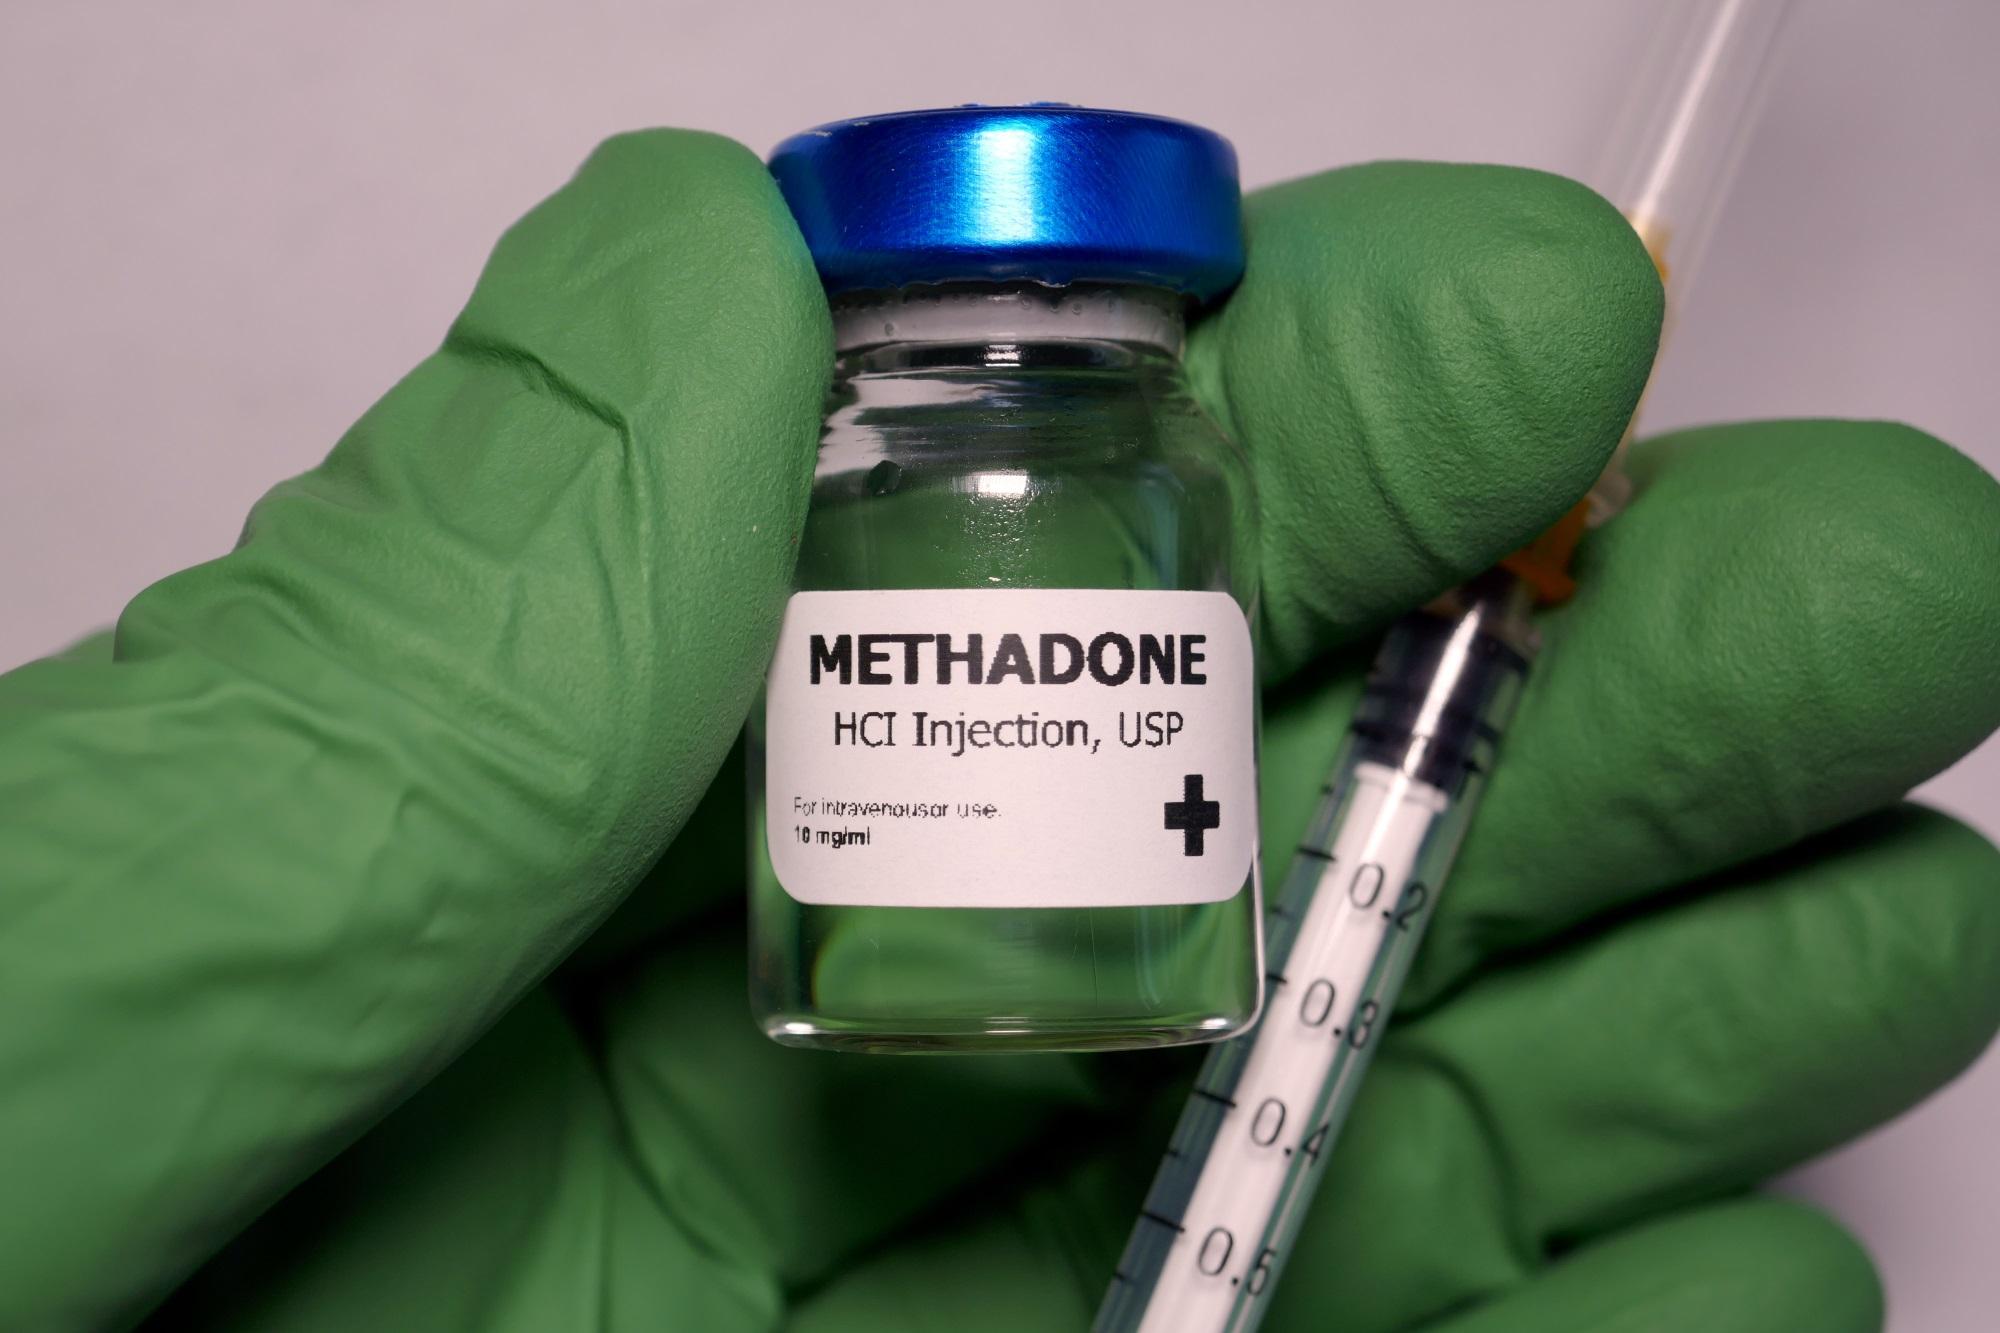 Faces of Addiction - Explaining Methadone